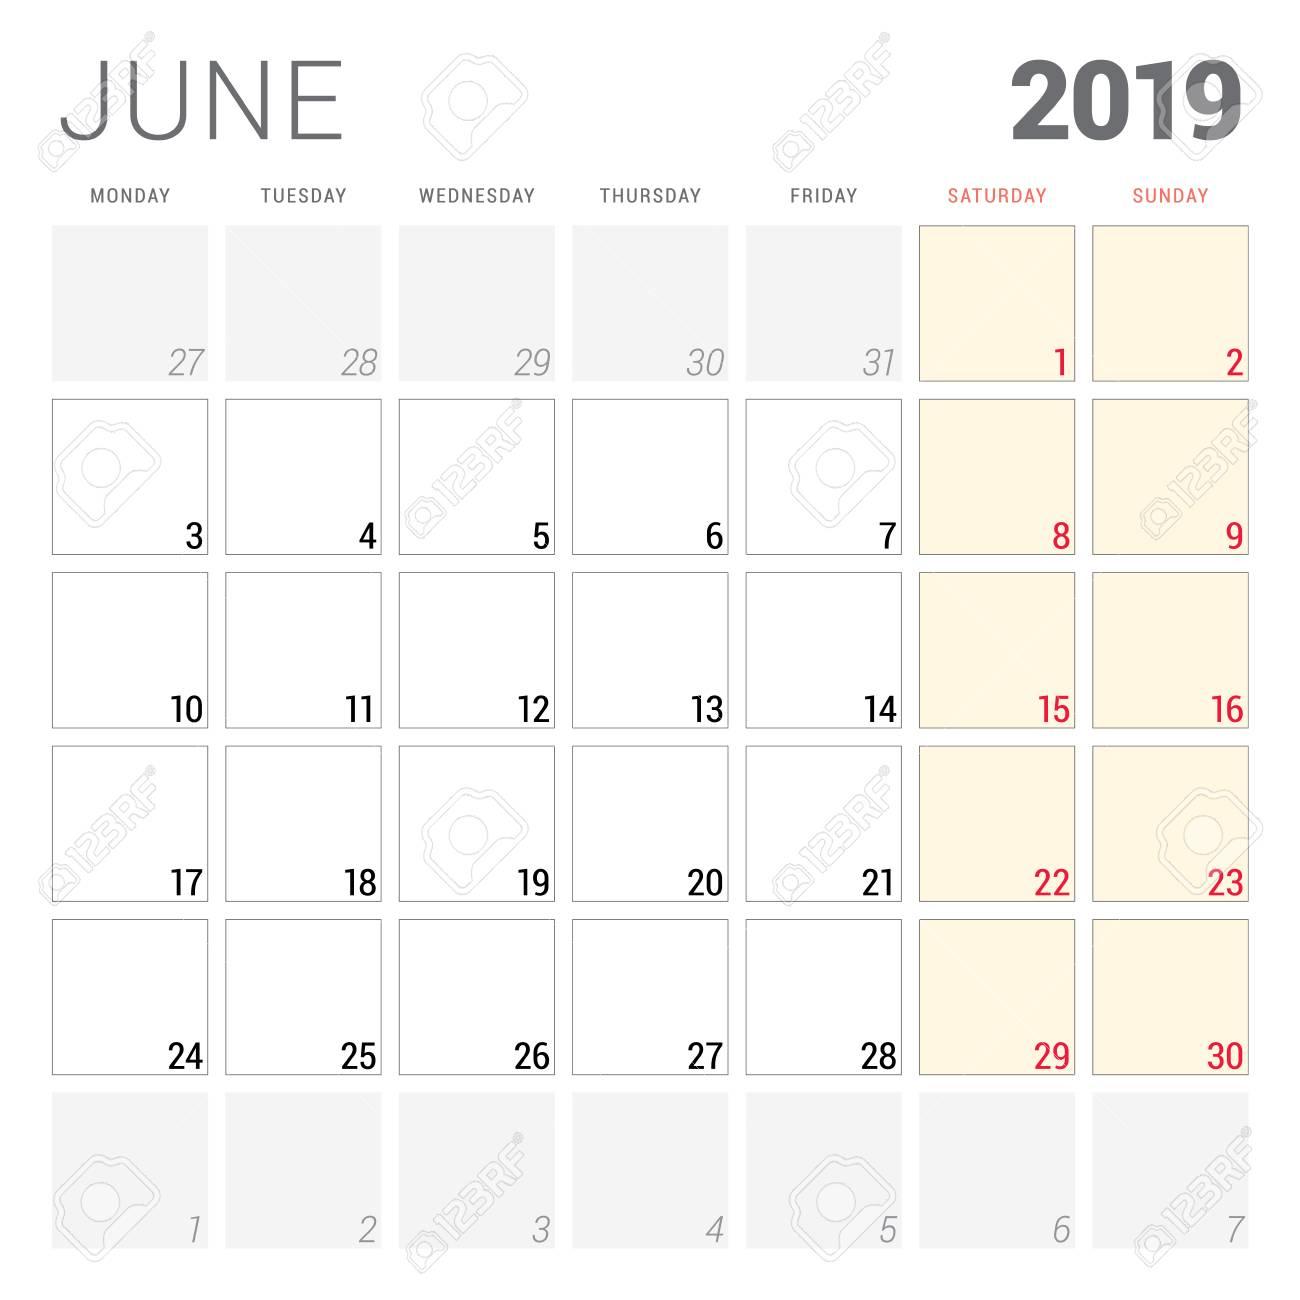 Calendar Planner For June 2019. Week Starts On Monday. Printable..